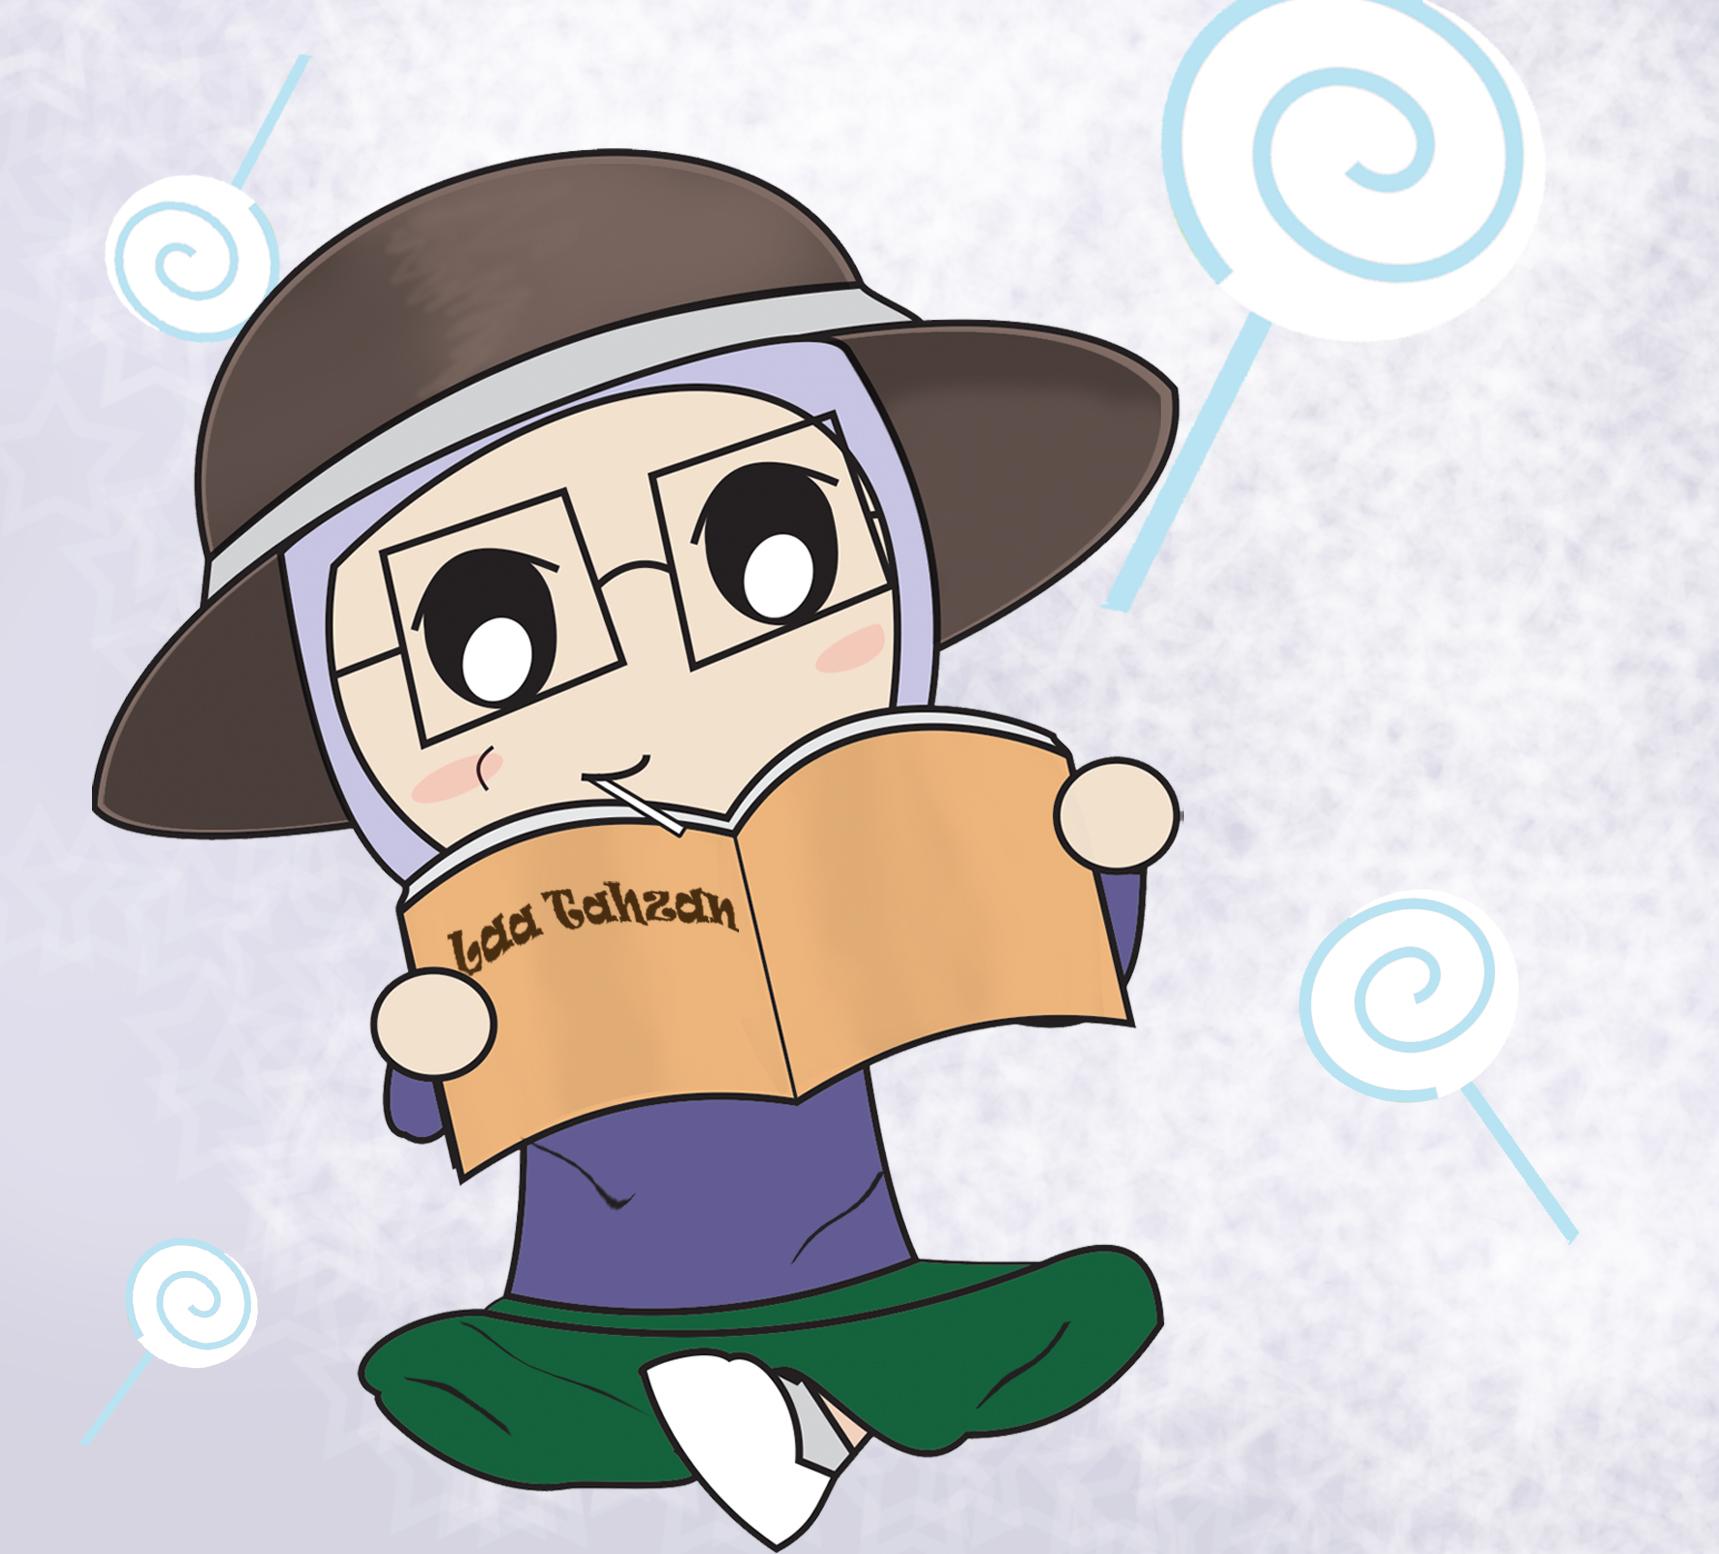 Koleksi Gambar Animasi Kartun Membaca Buku